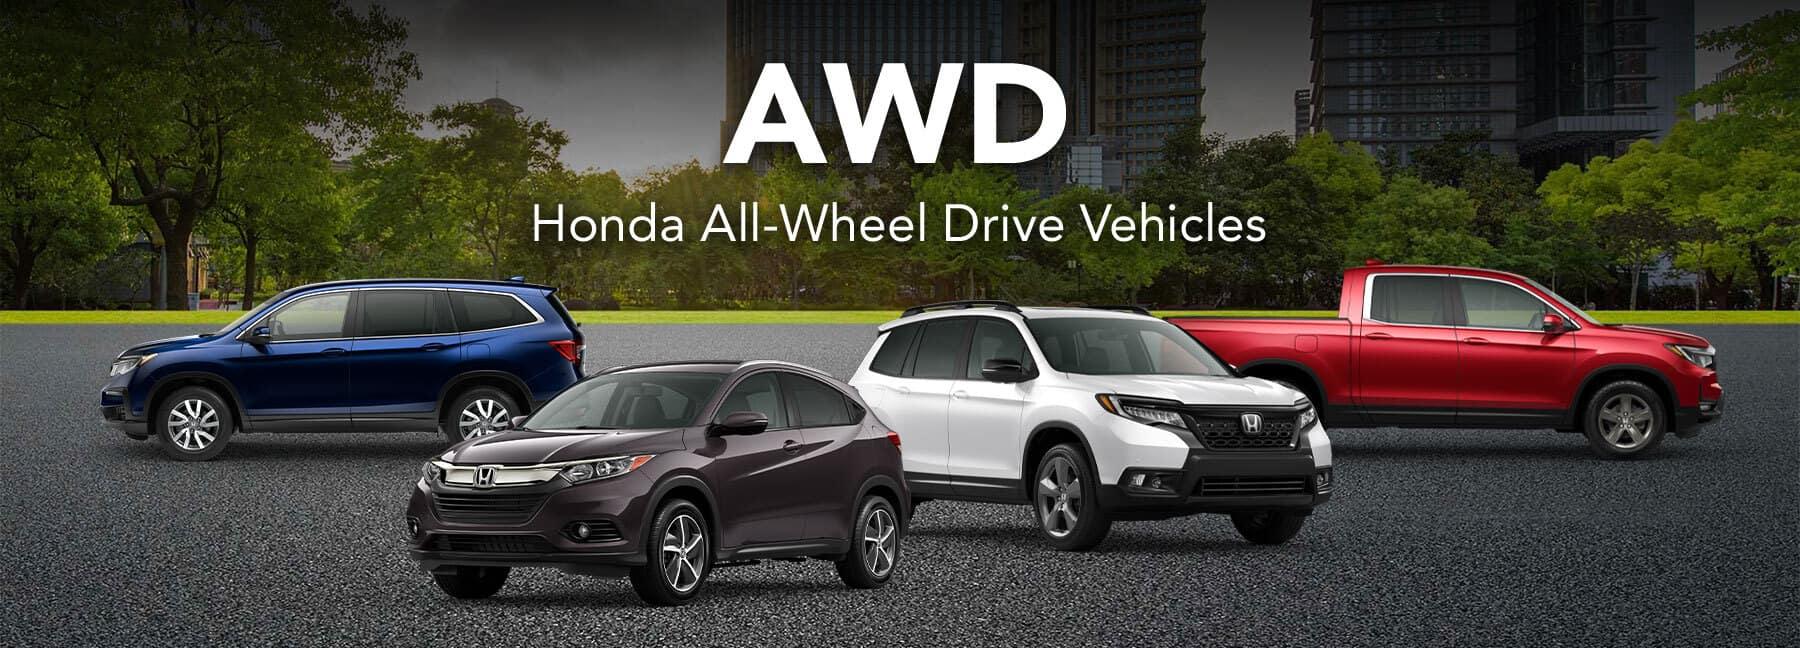 Honda AWD Lineup